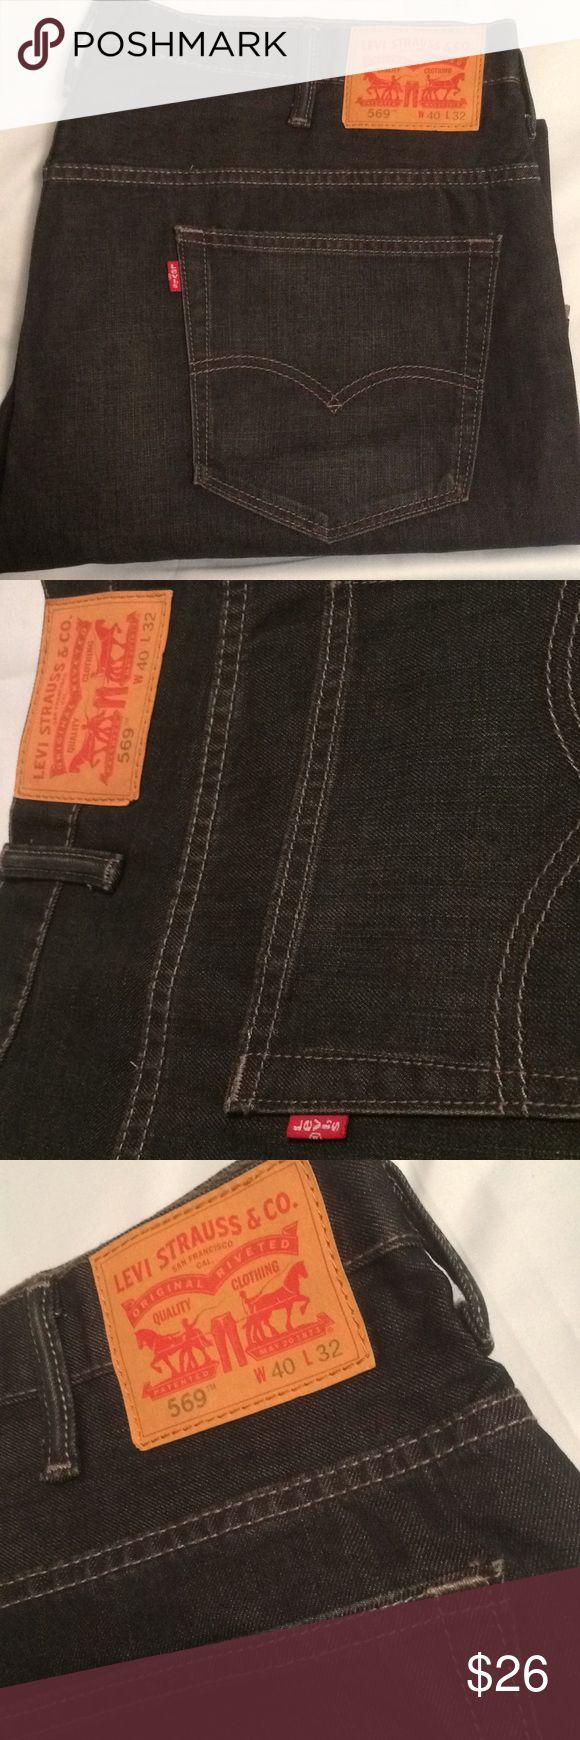 Levi's Strauss & Co. 569 blue denim Jeans 40 x 32 Levi's 569 blue denim jeans. Waist 40 Length 32 Like new. Levi's Jeans